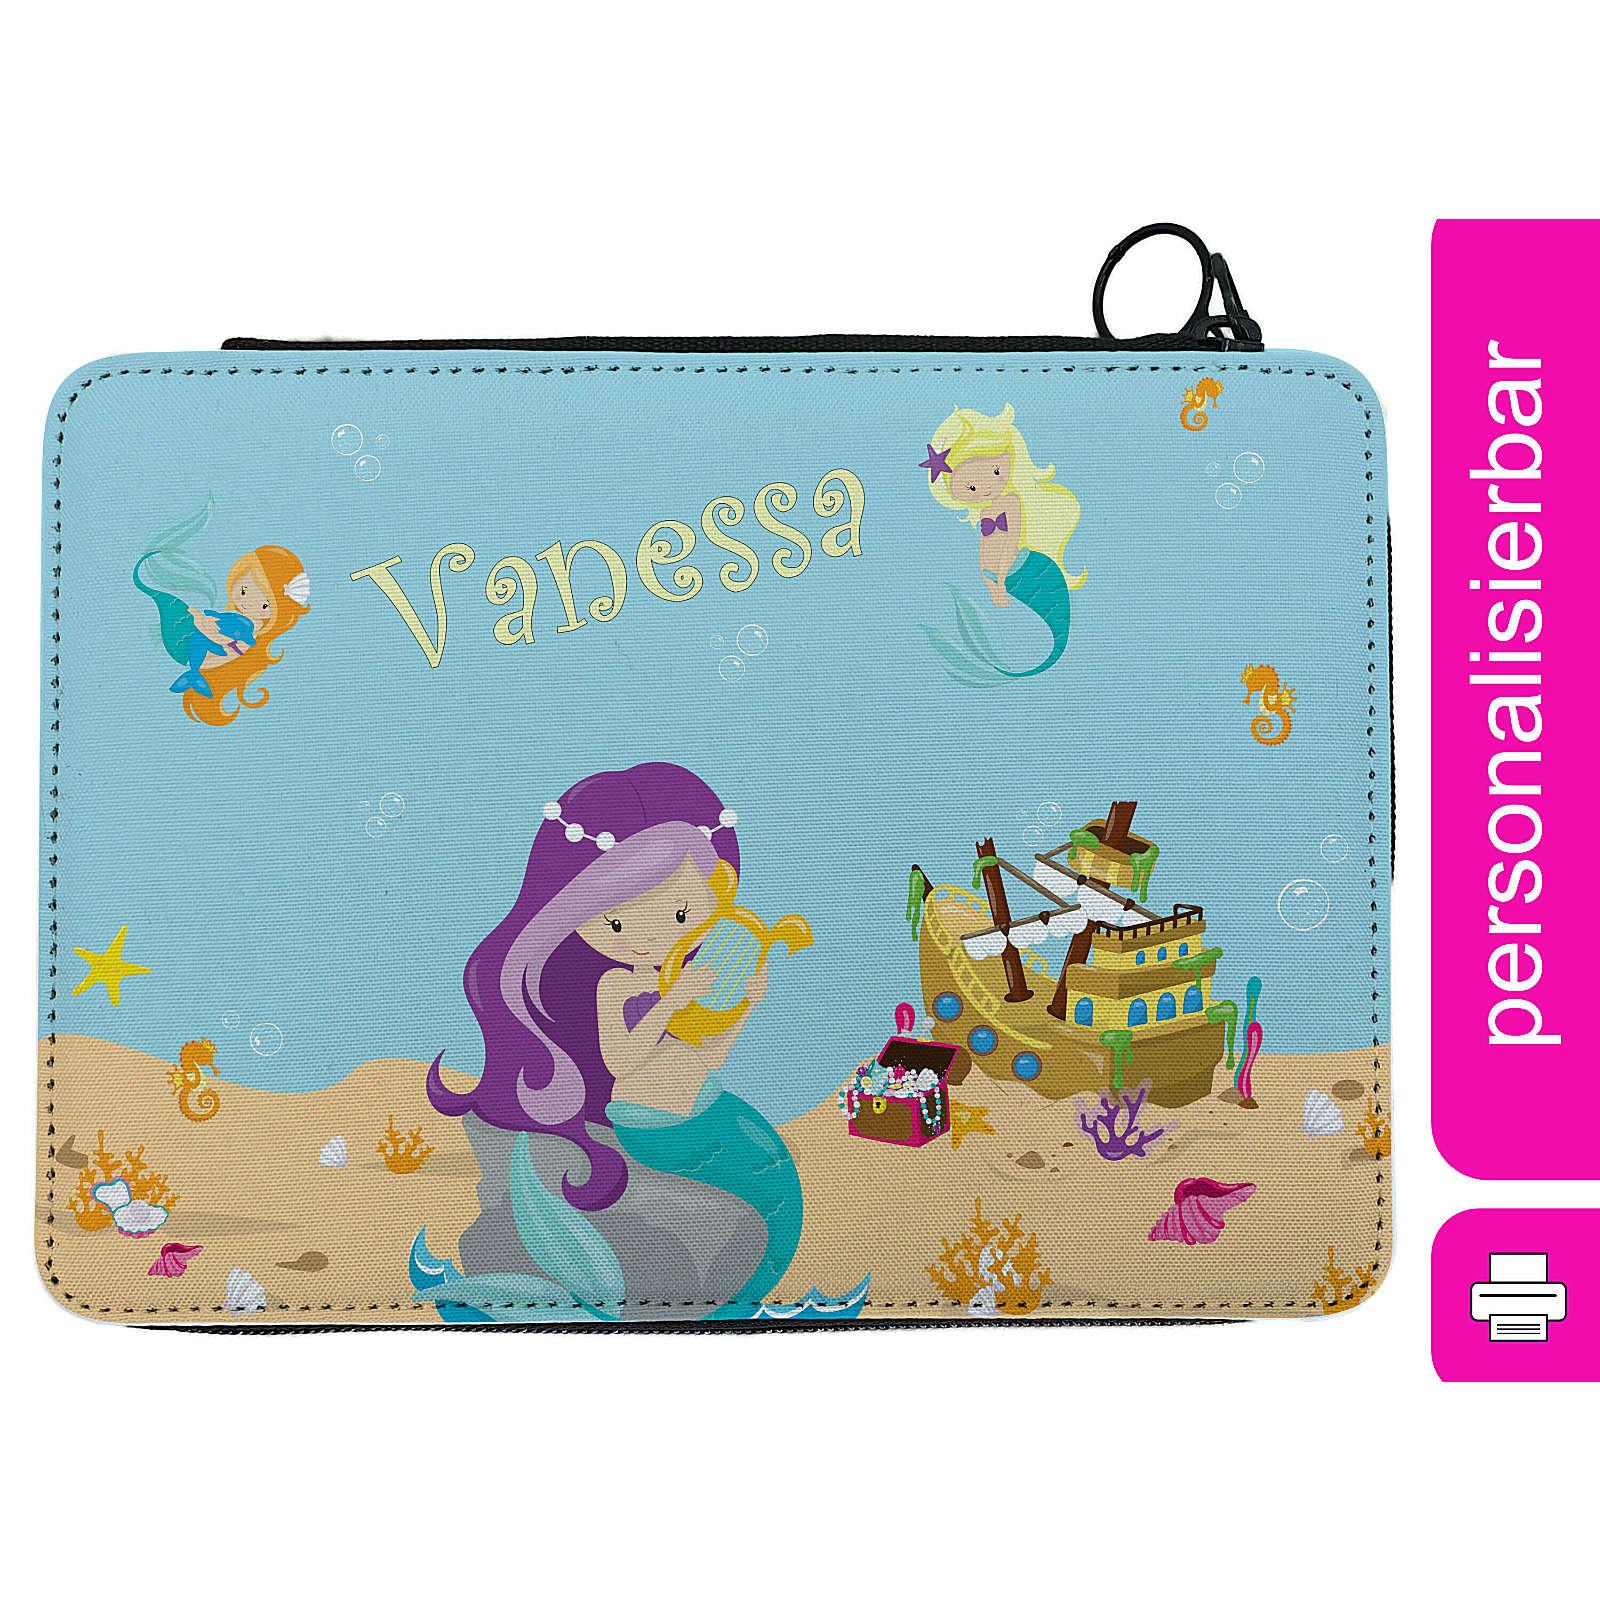 CreaDesign Federmäppchen personalisiert mit Namen Meerjungfrau befüllt mehrfarbig